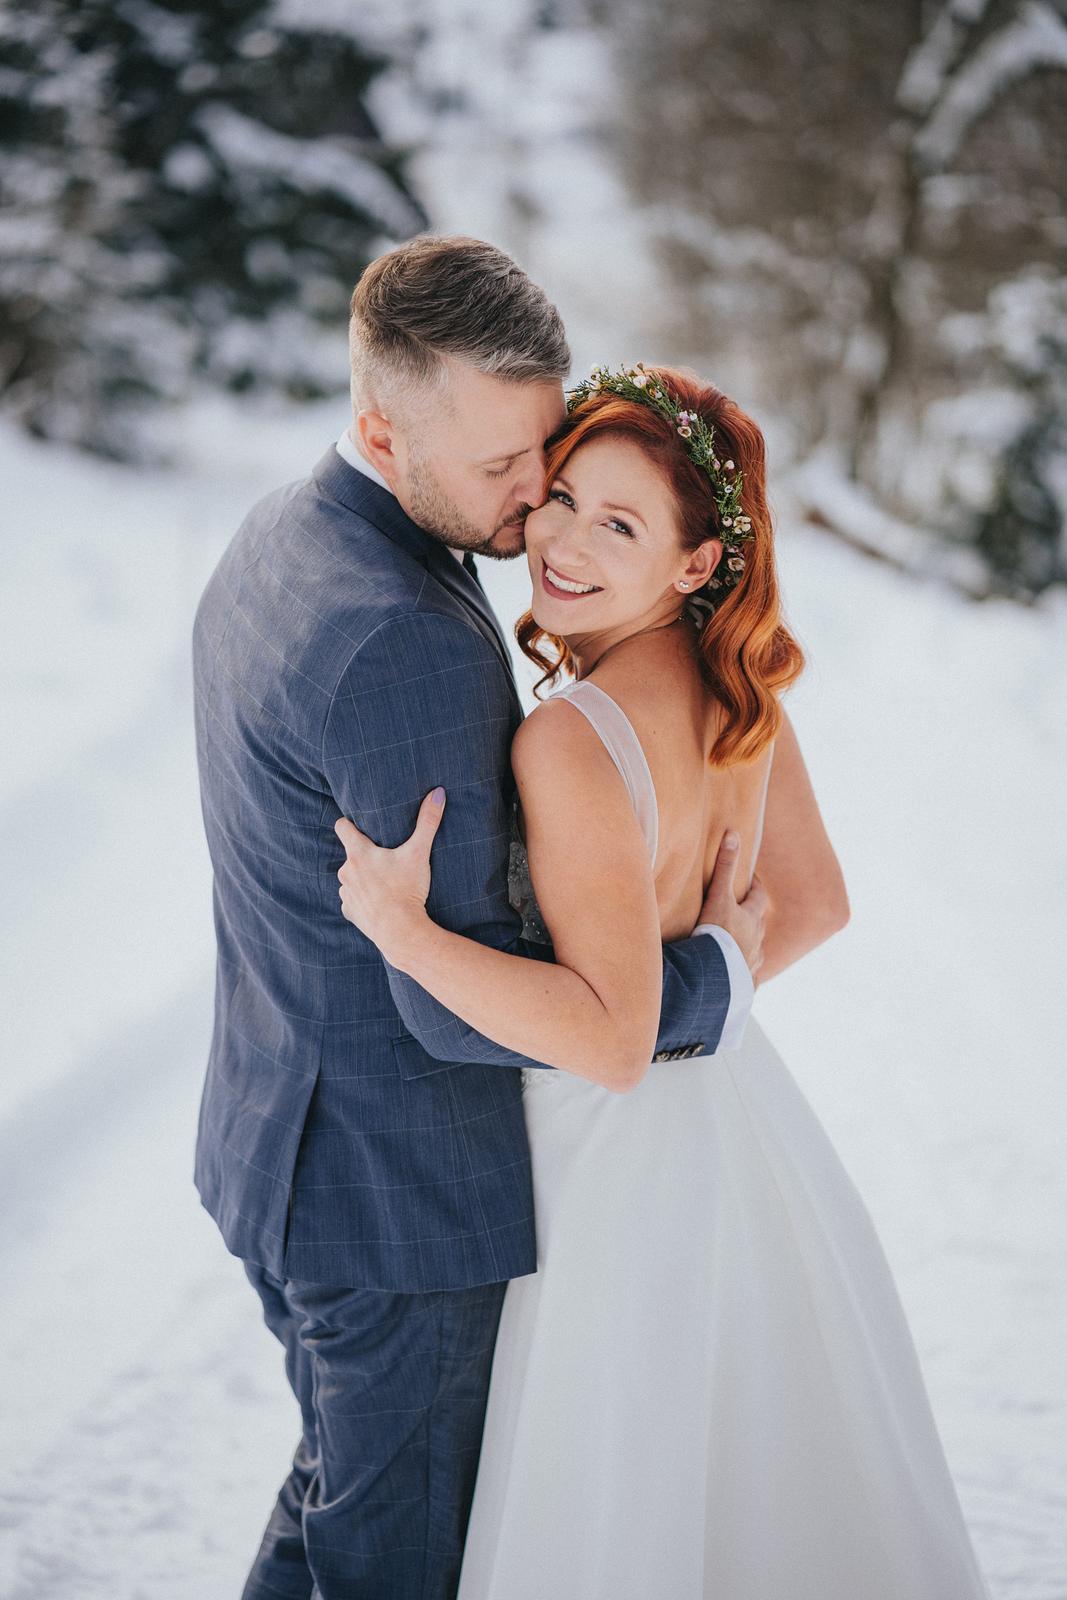 Zimní svatba M&M - Obrázek č. 2